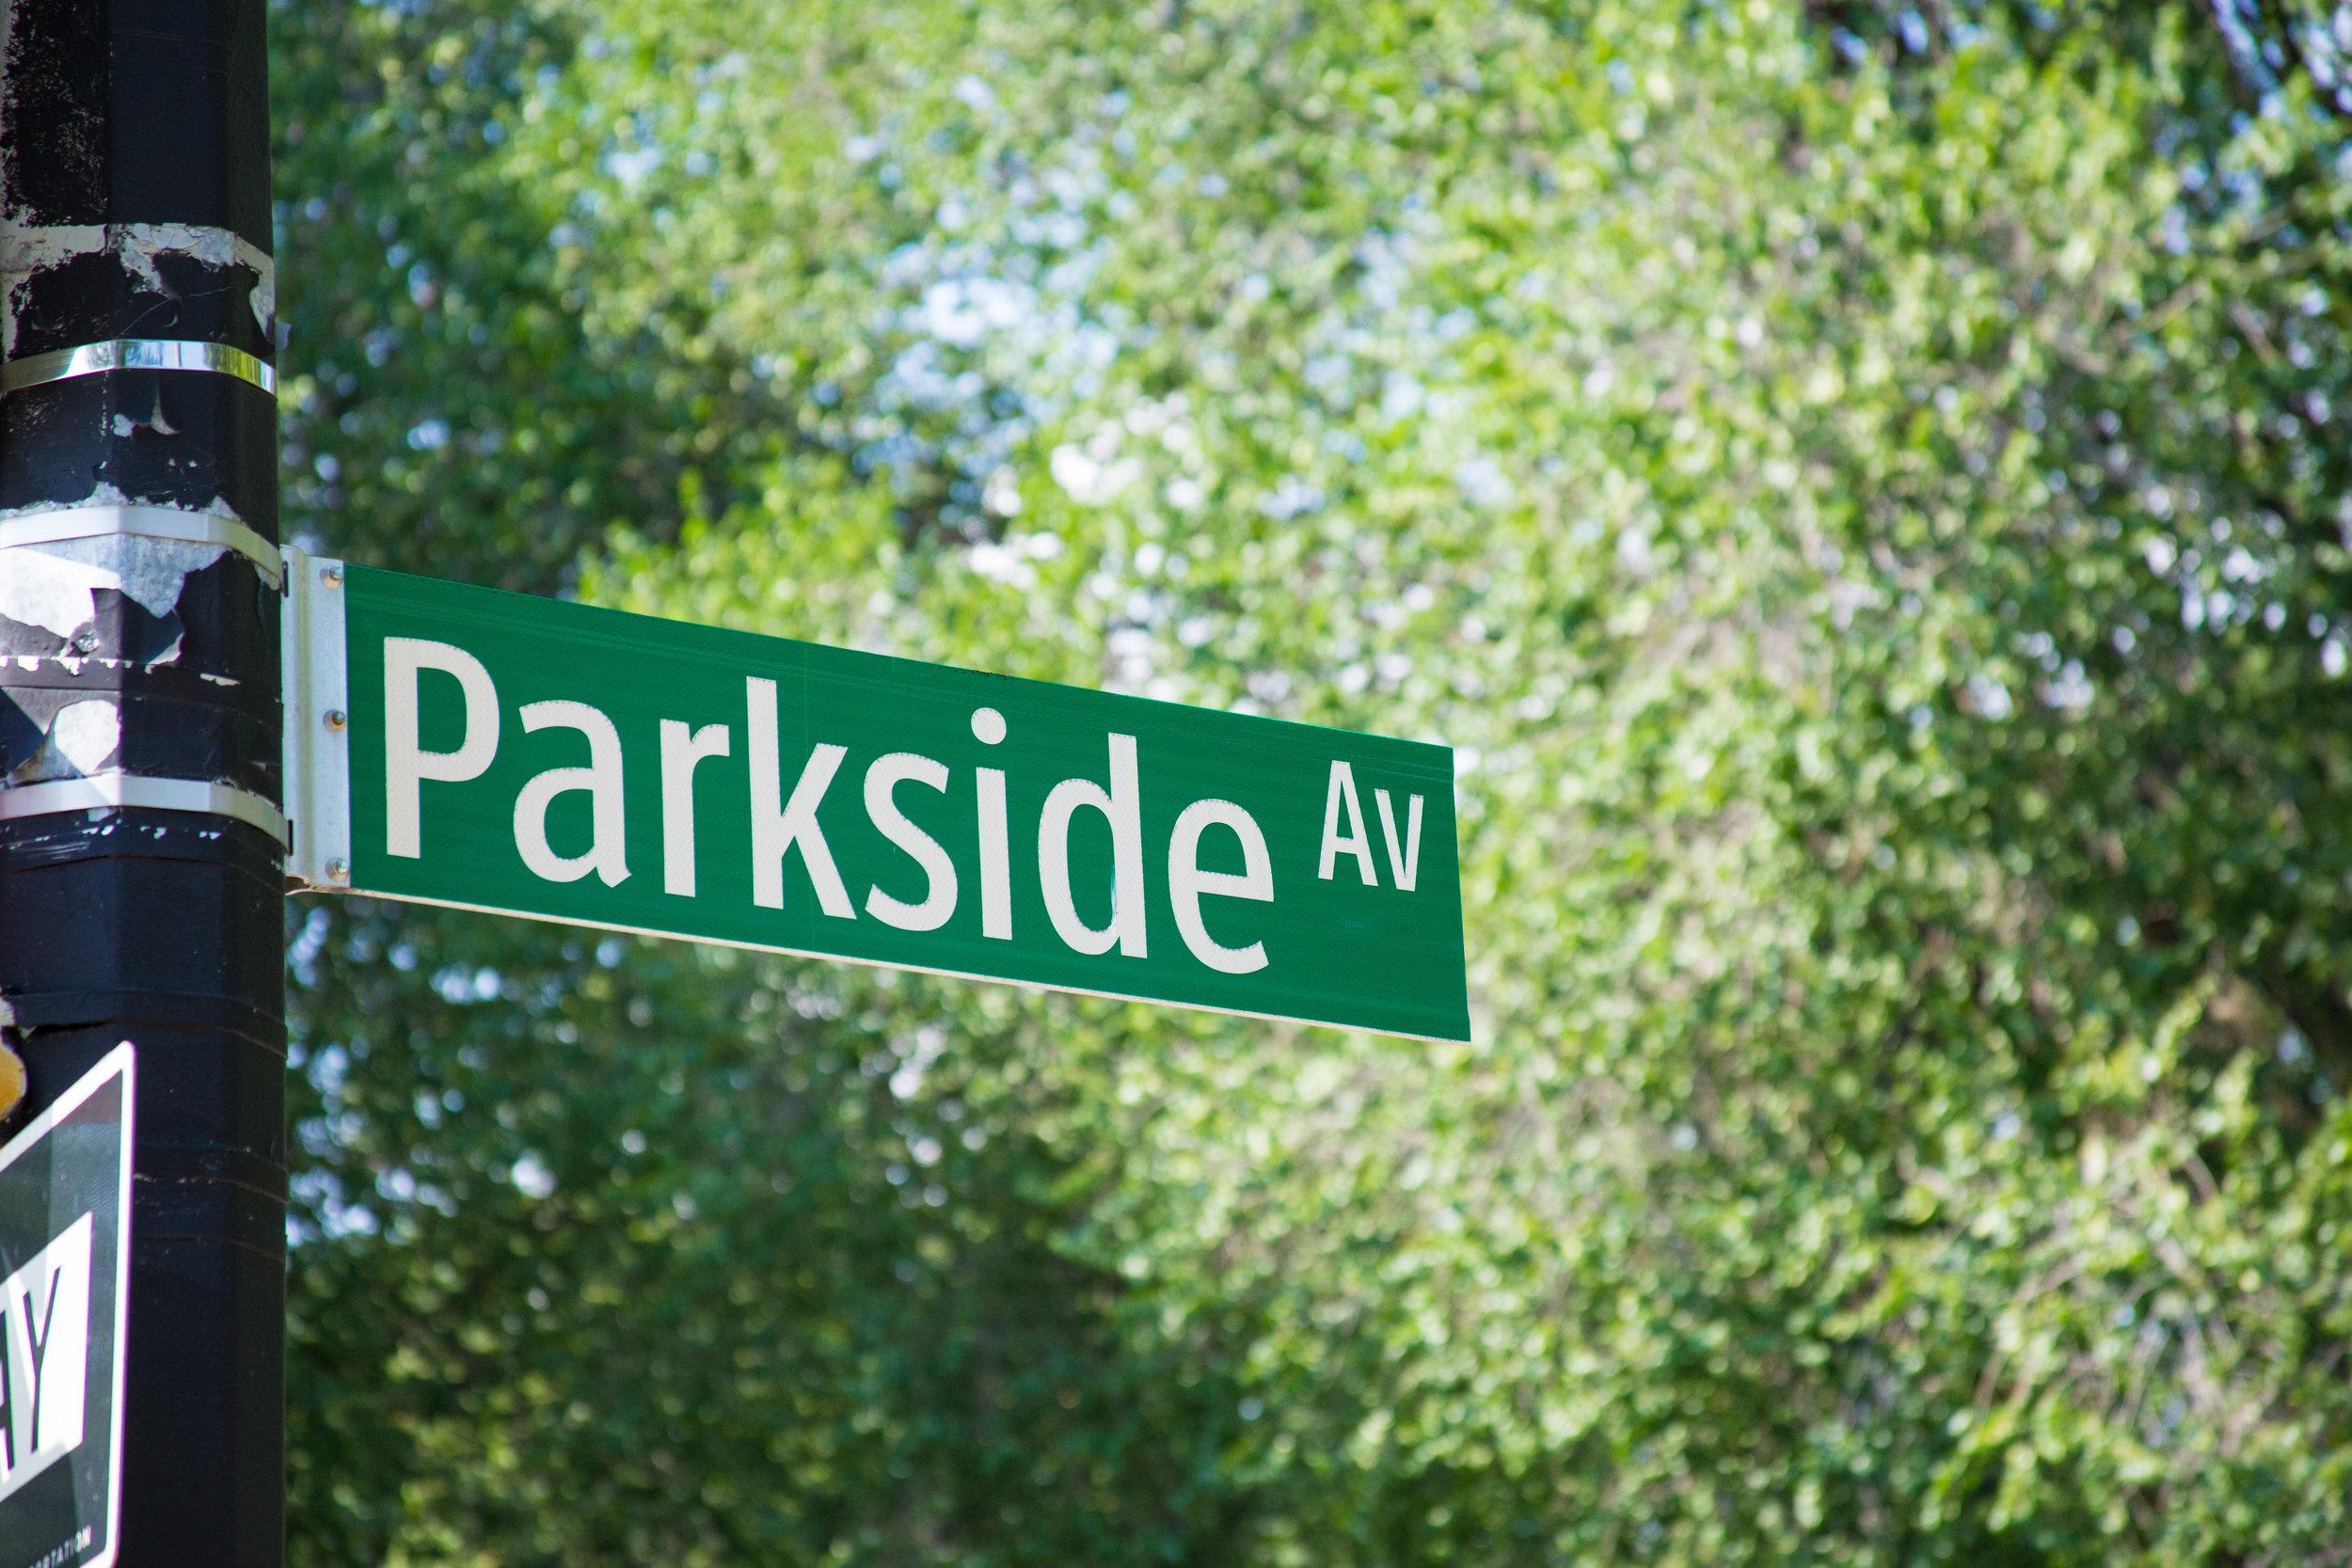 LSNY_Parade_Grounds-7.jpg